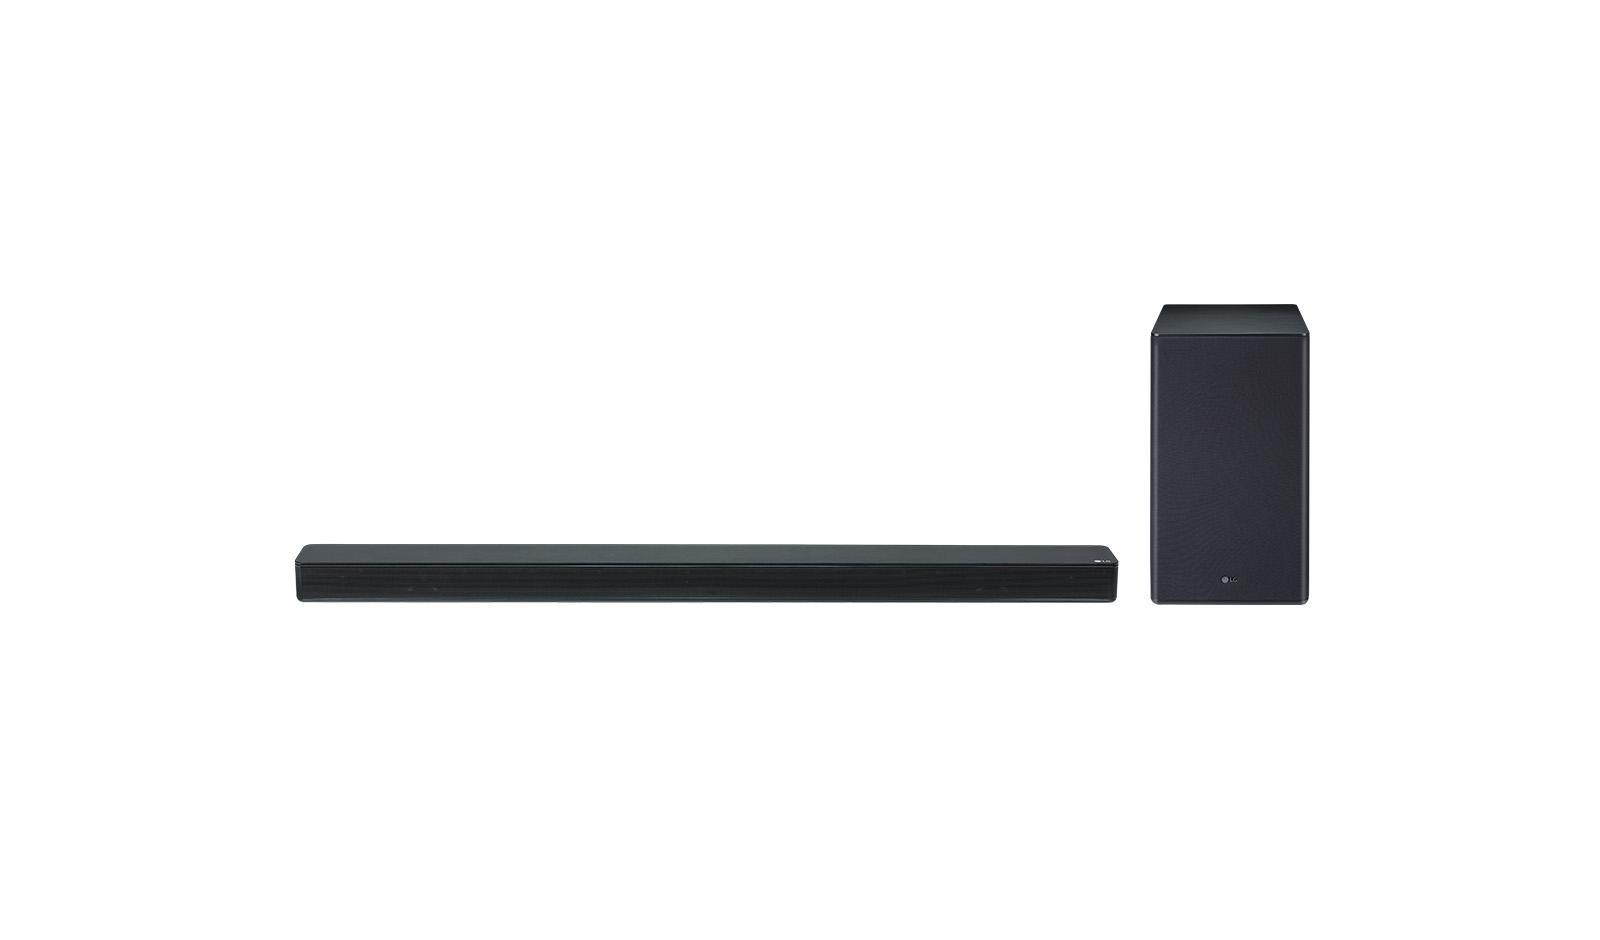 LG Sound Bar SK8 main image